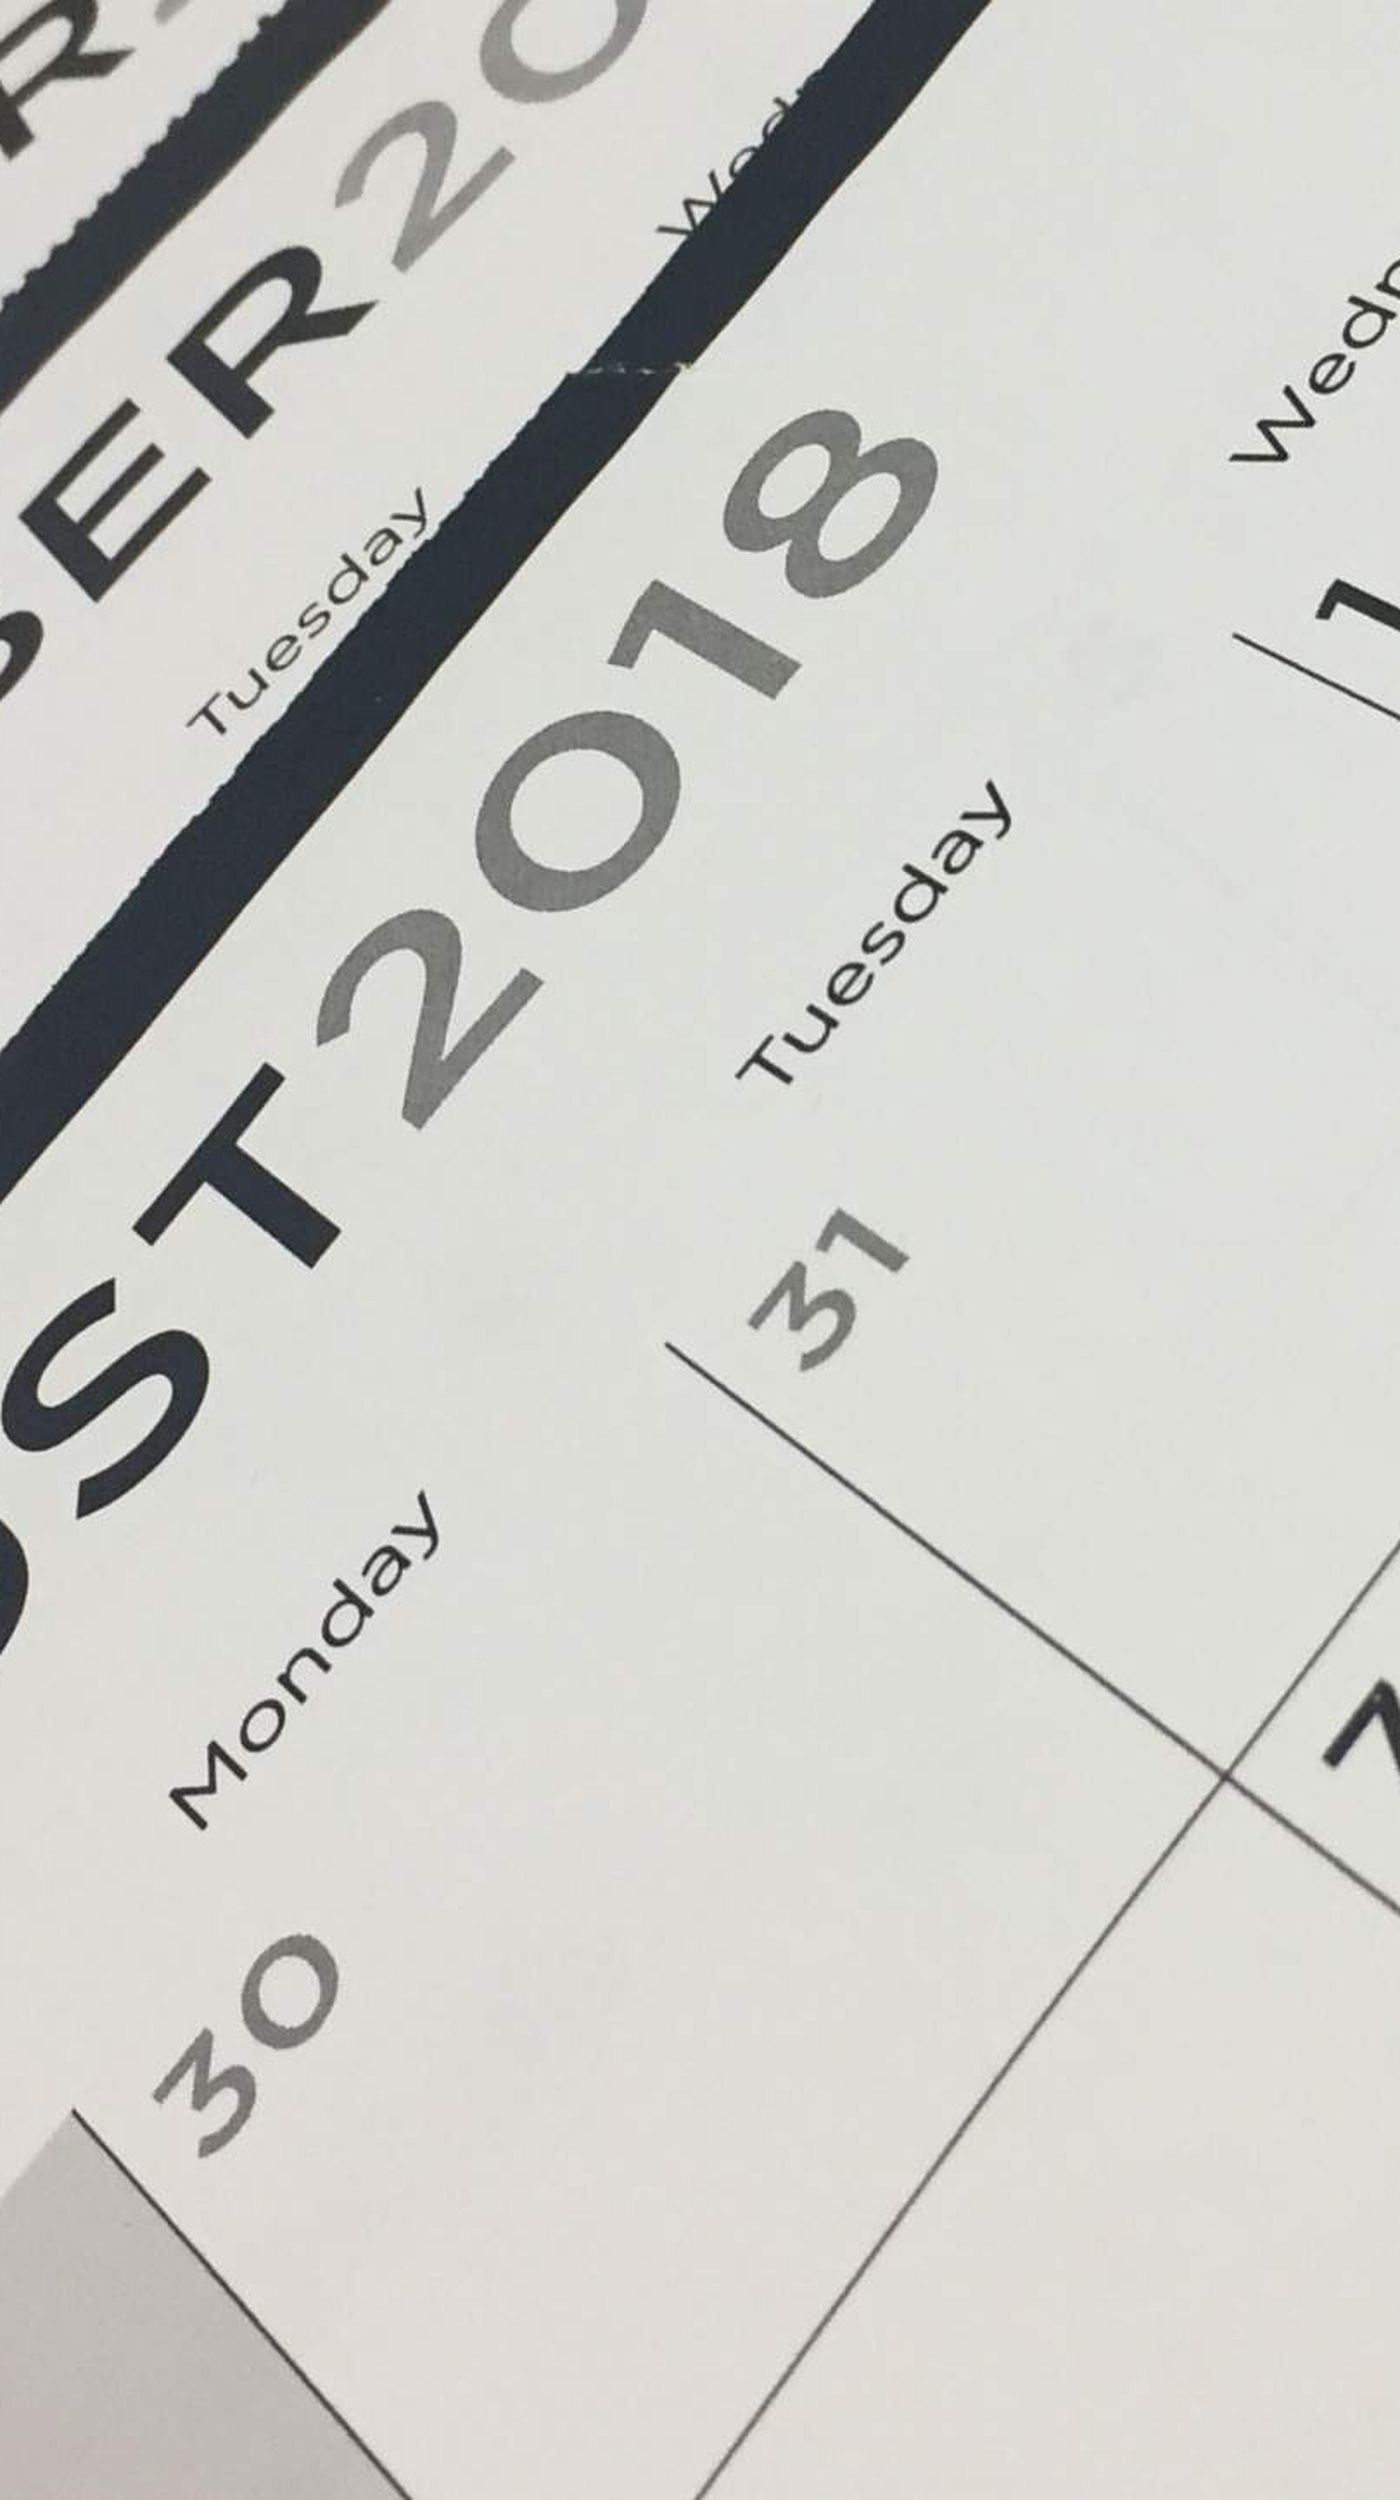 Hillsborough County Schools 2018 19 Calendar Throughout Holidays For Hillsborough County Schools